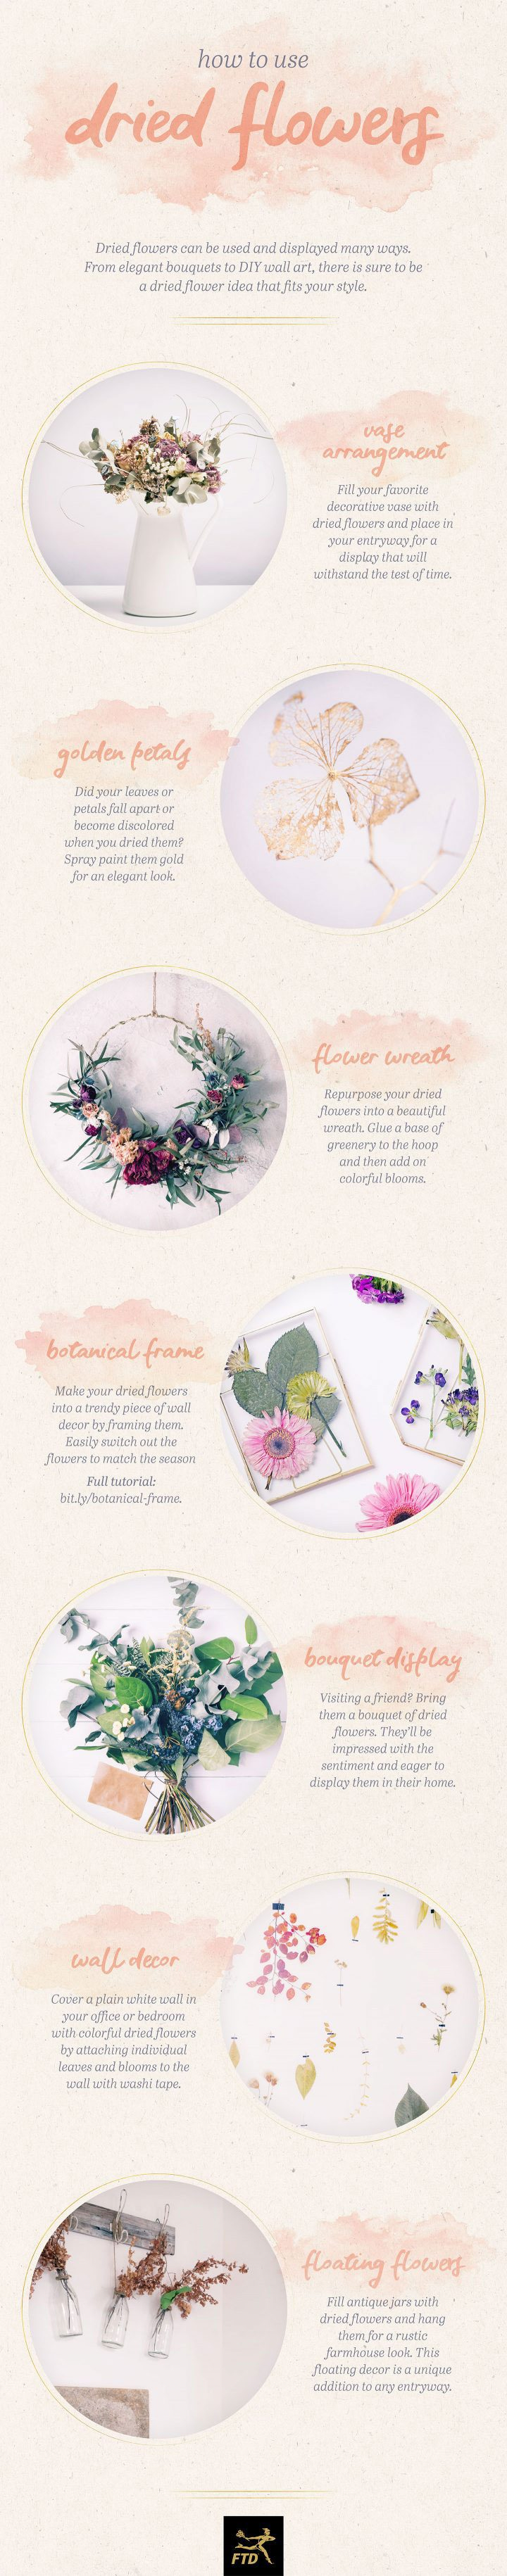 dried flower arrangement ideas infographic